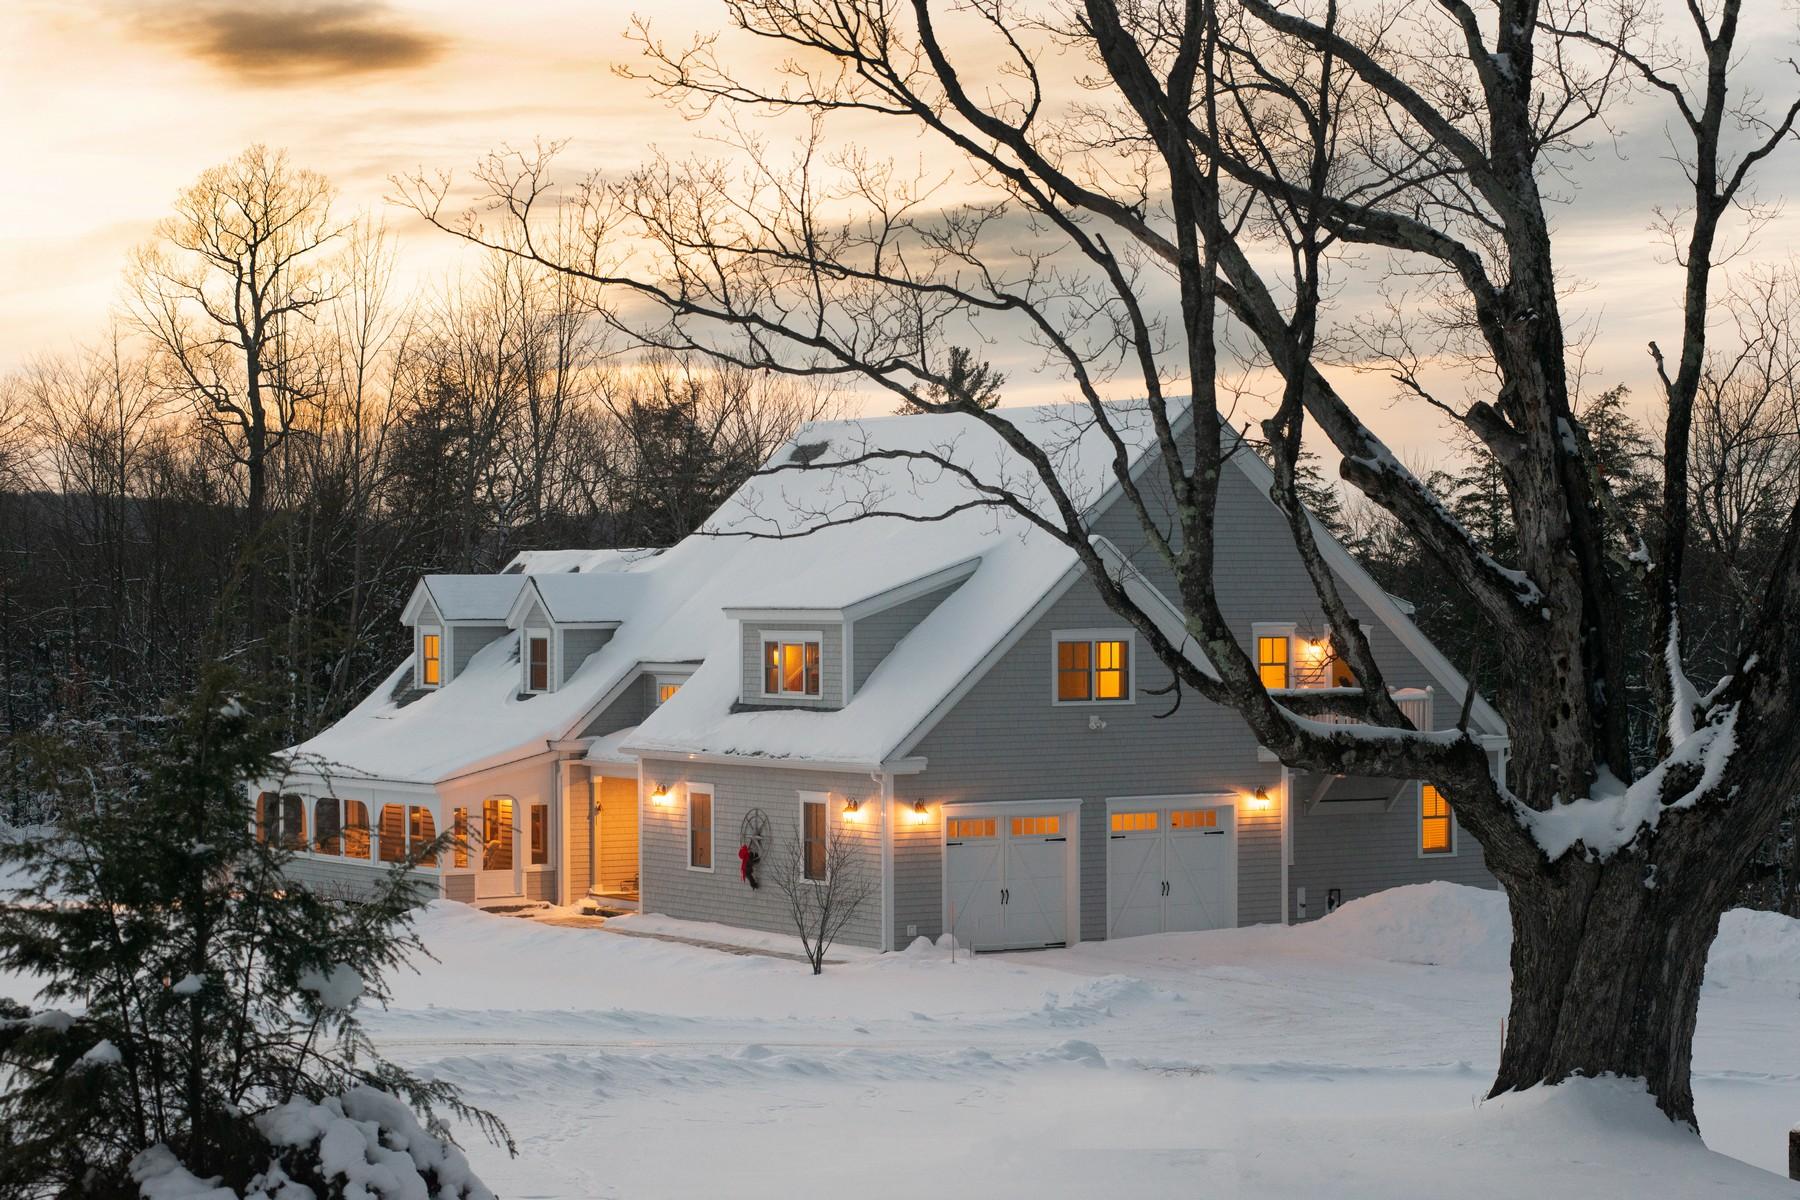 Single Family Home for Sale at 778 Pratt Road, Cambridge 778 Pratt Rd Cambridge, Vermont 05464 United States